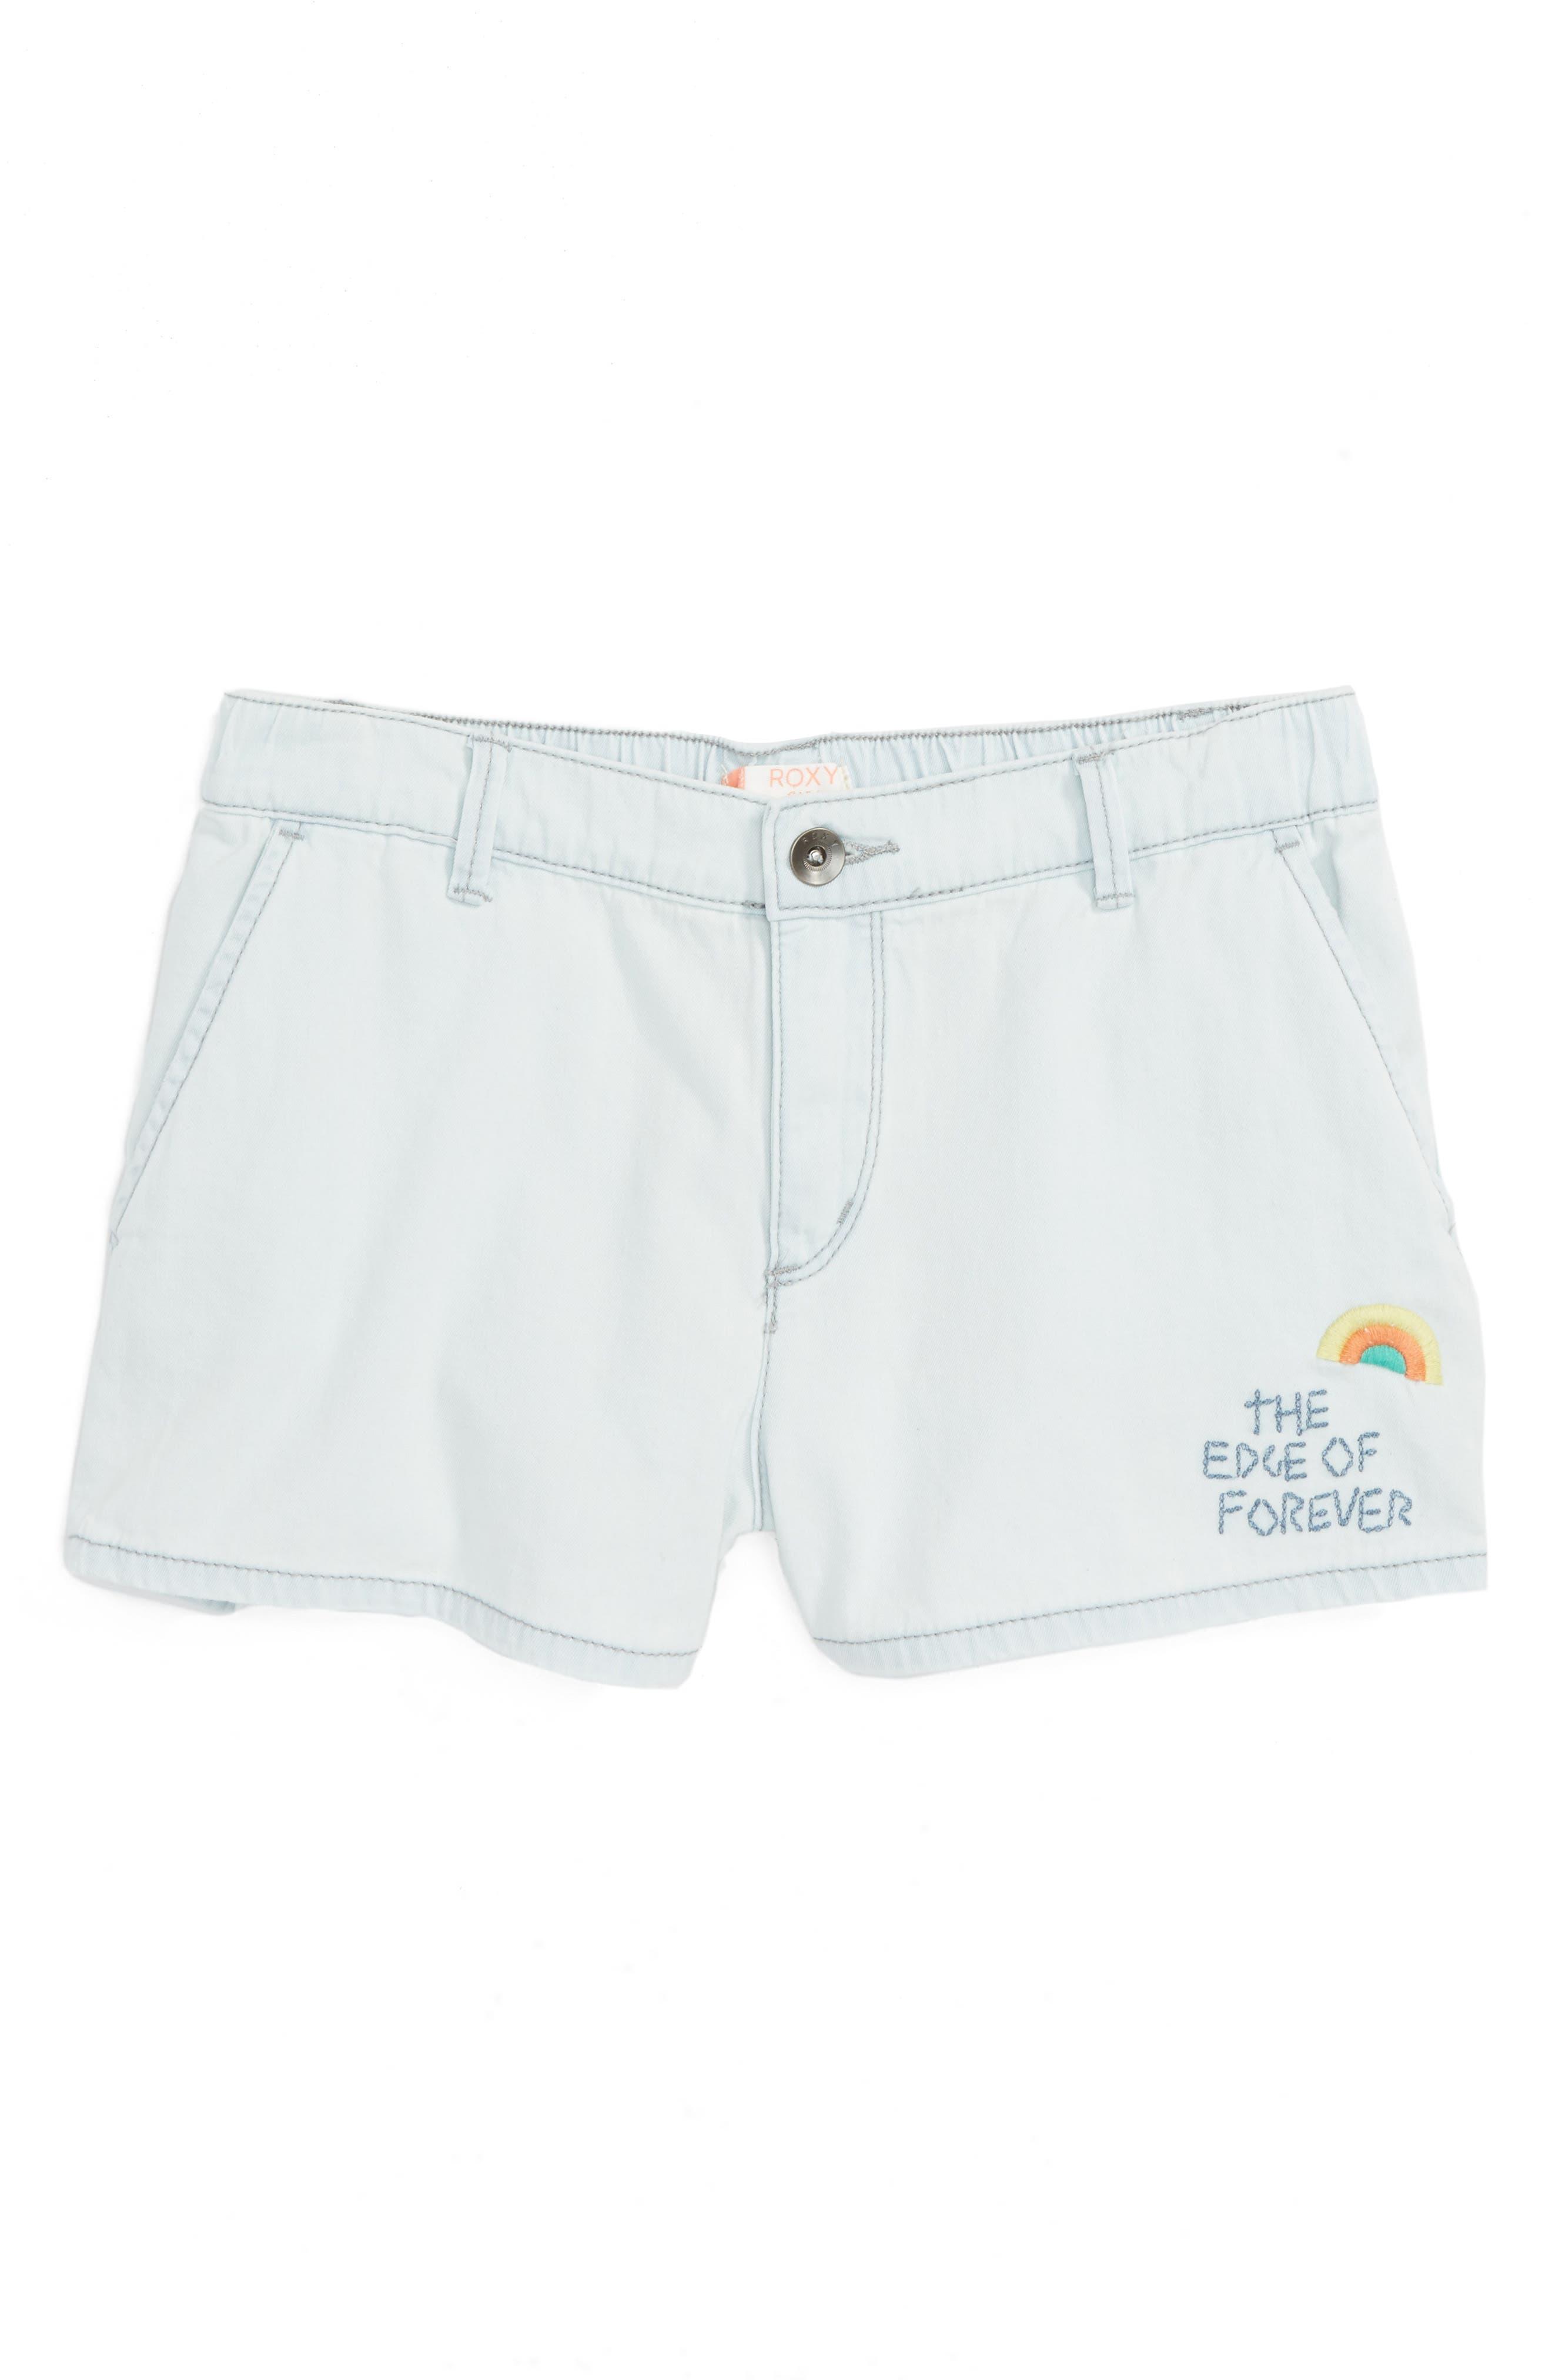 West Coast And U - Edge of Forever Rainbow Shorts,                         Main,                         color, 453